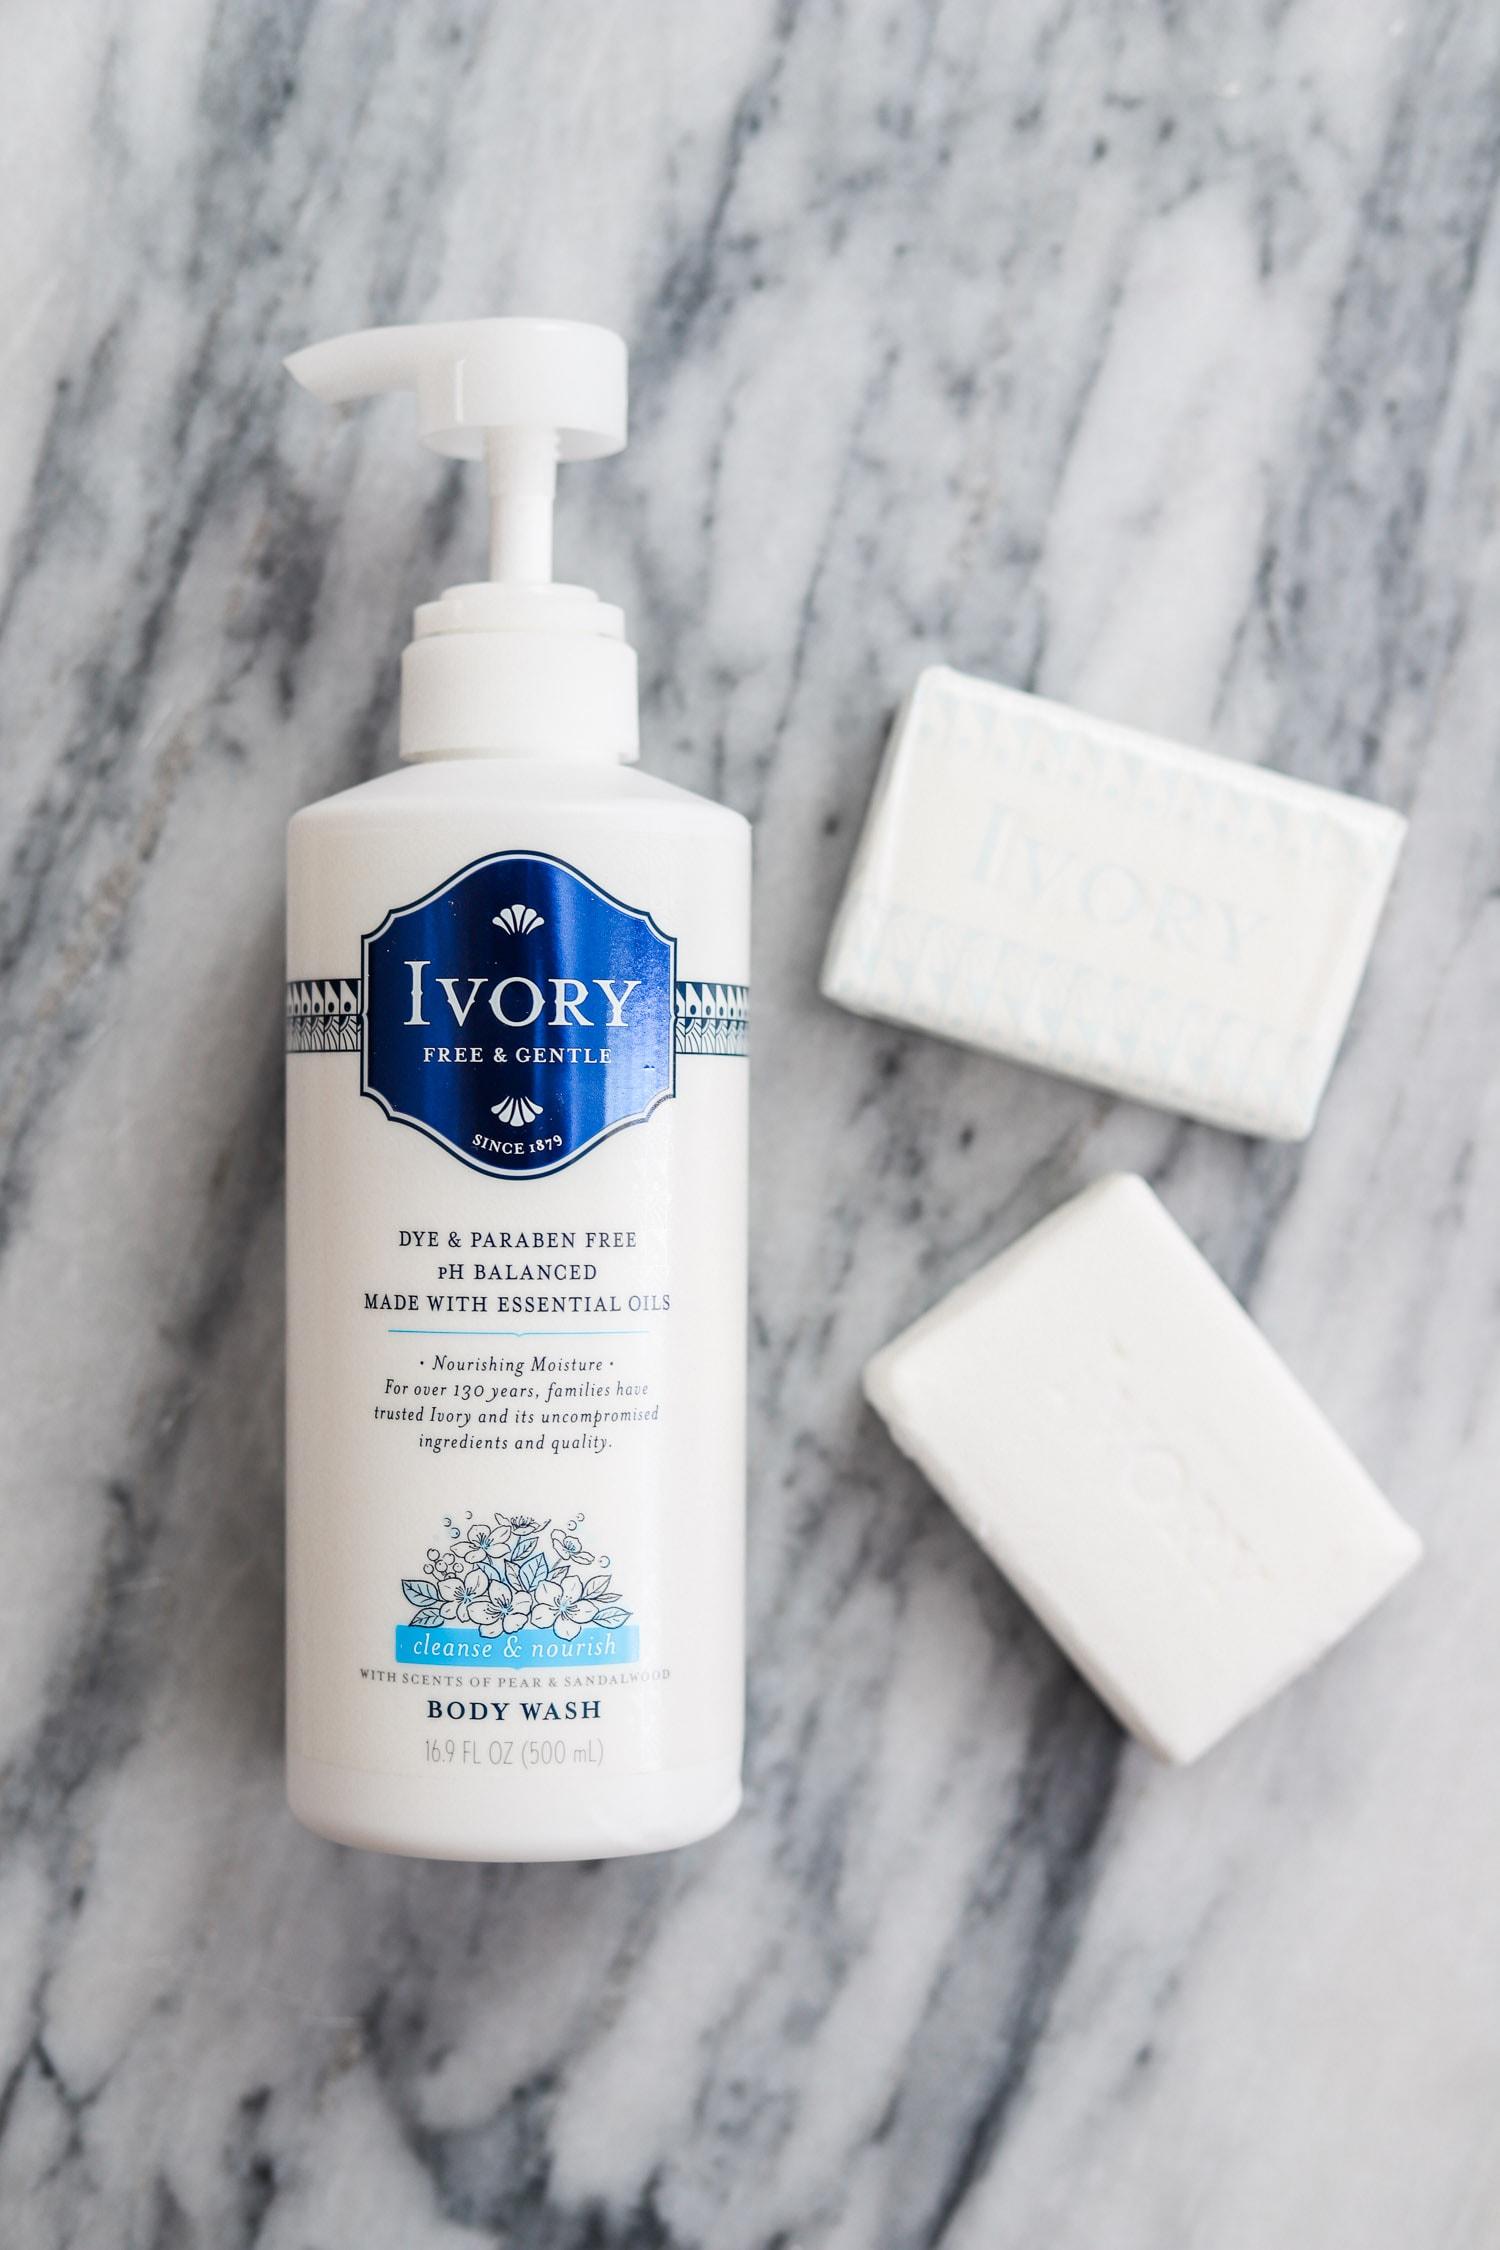 Ivory lotion | grandmother's beauty secrets | Ashley Brooke Nicholas